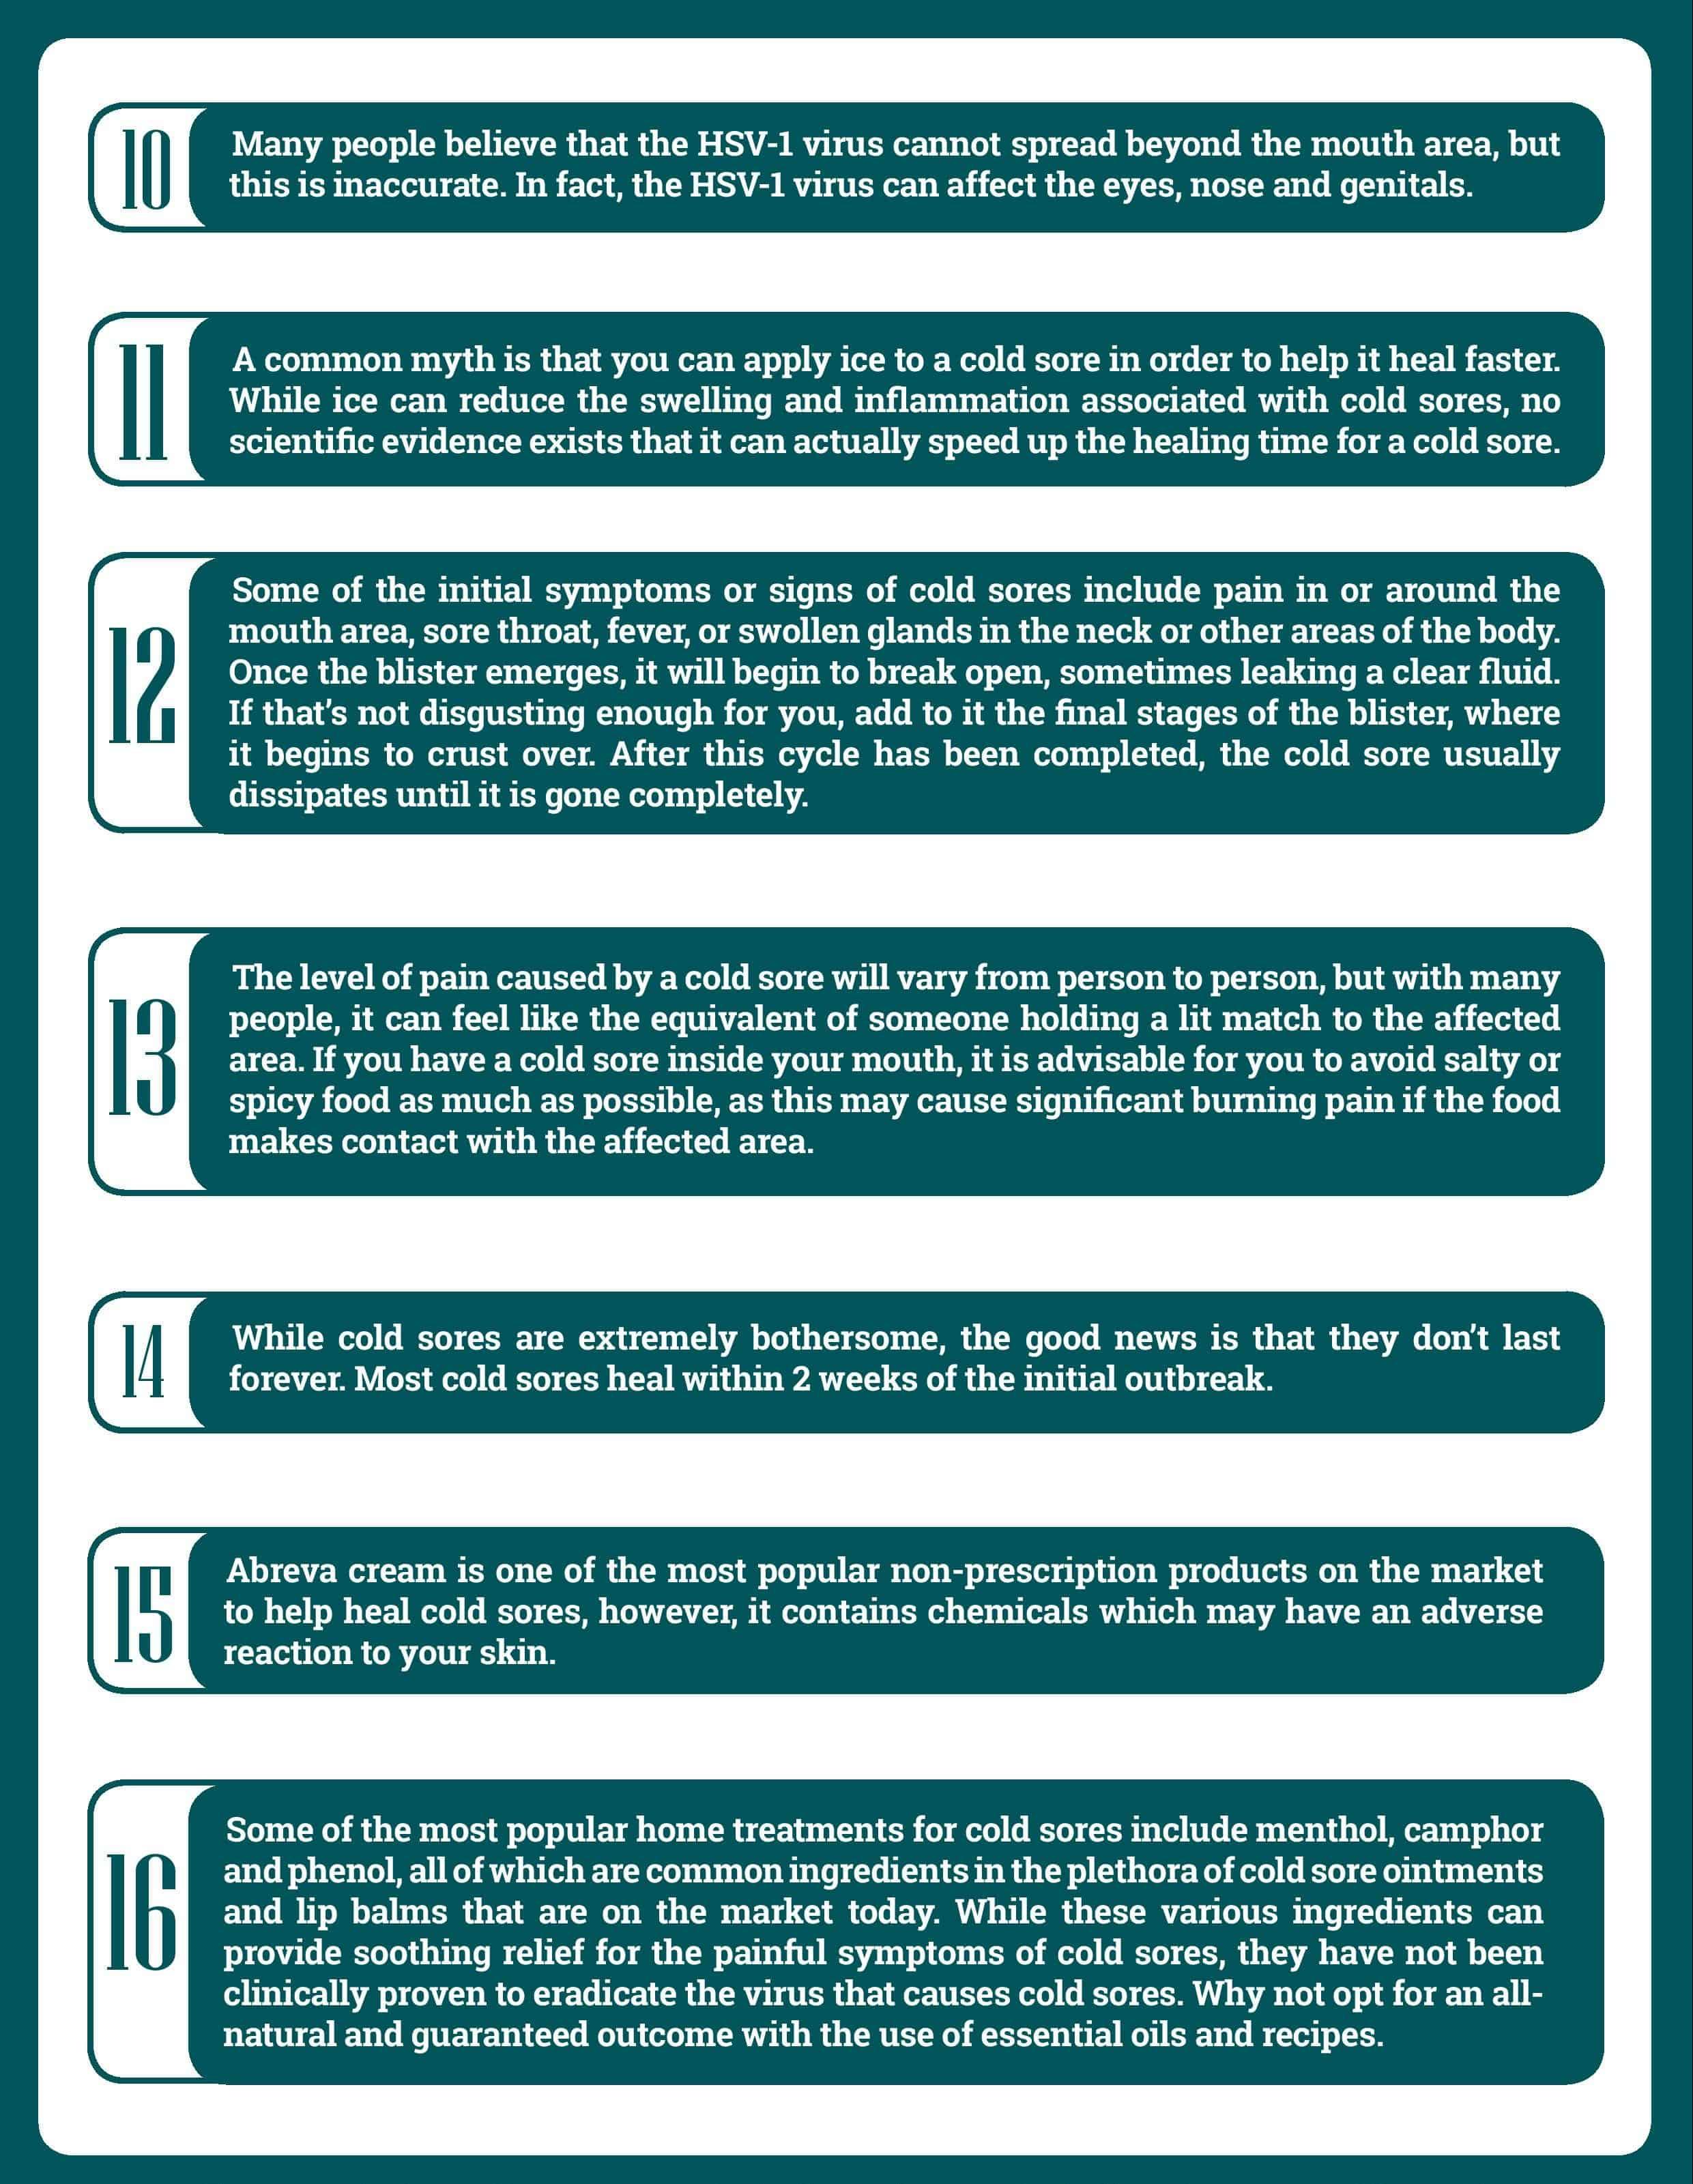 8 Essential Oil Recipes For Cold Sore Relief | Essential Oil